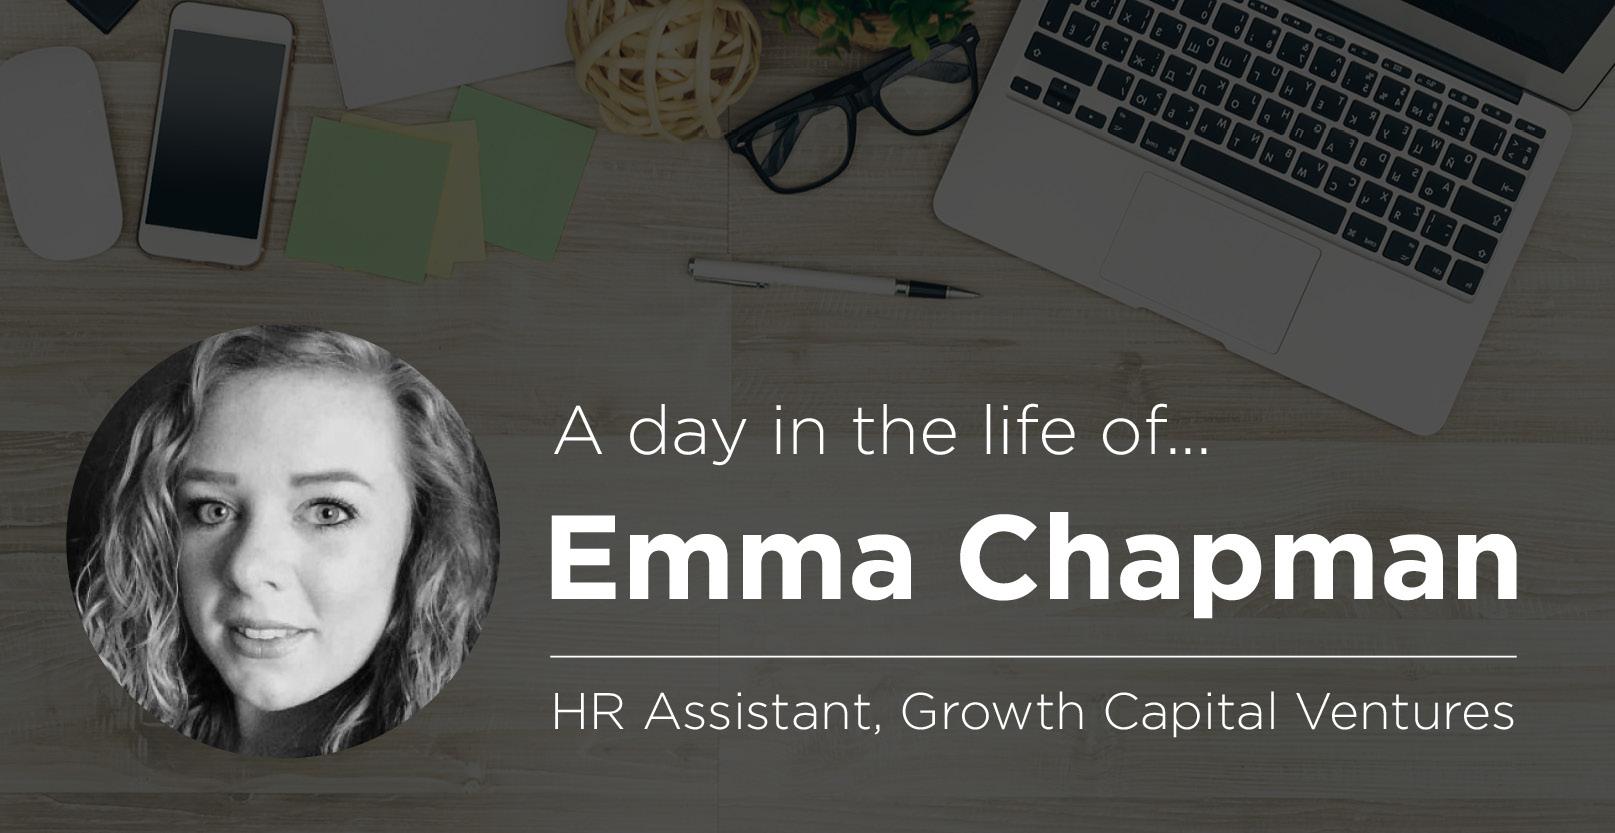 Emma-Chapman-Day-In-The-Life-LinkedIn.jpg